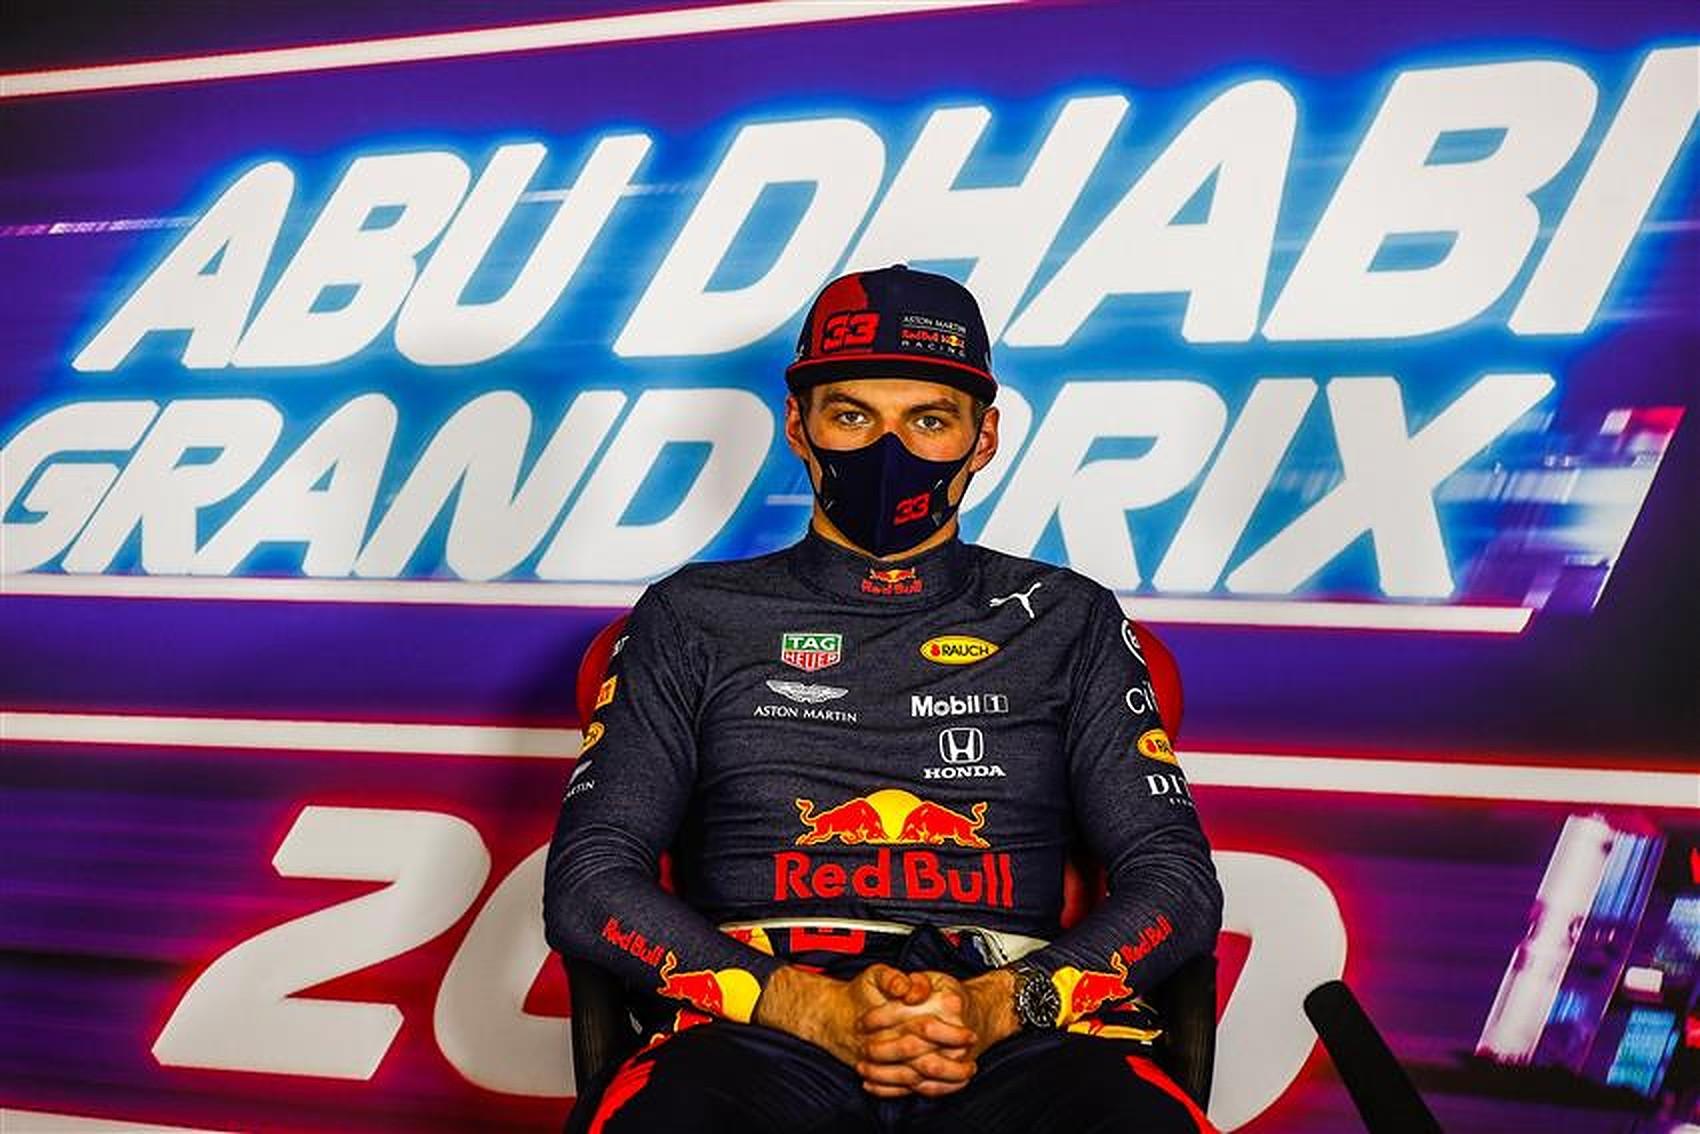 Max Verstappen and Sergio Perez Red Bull 2021 car development - Formula1News.co.uk